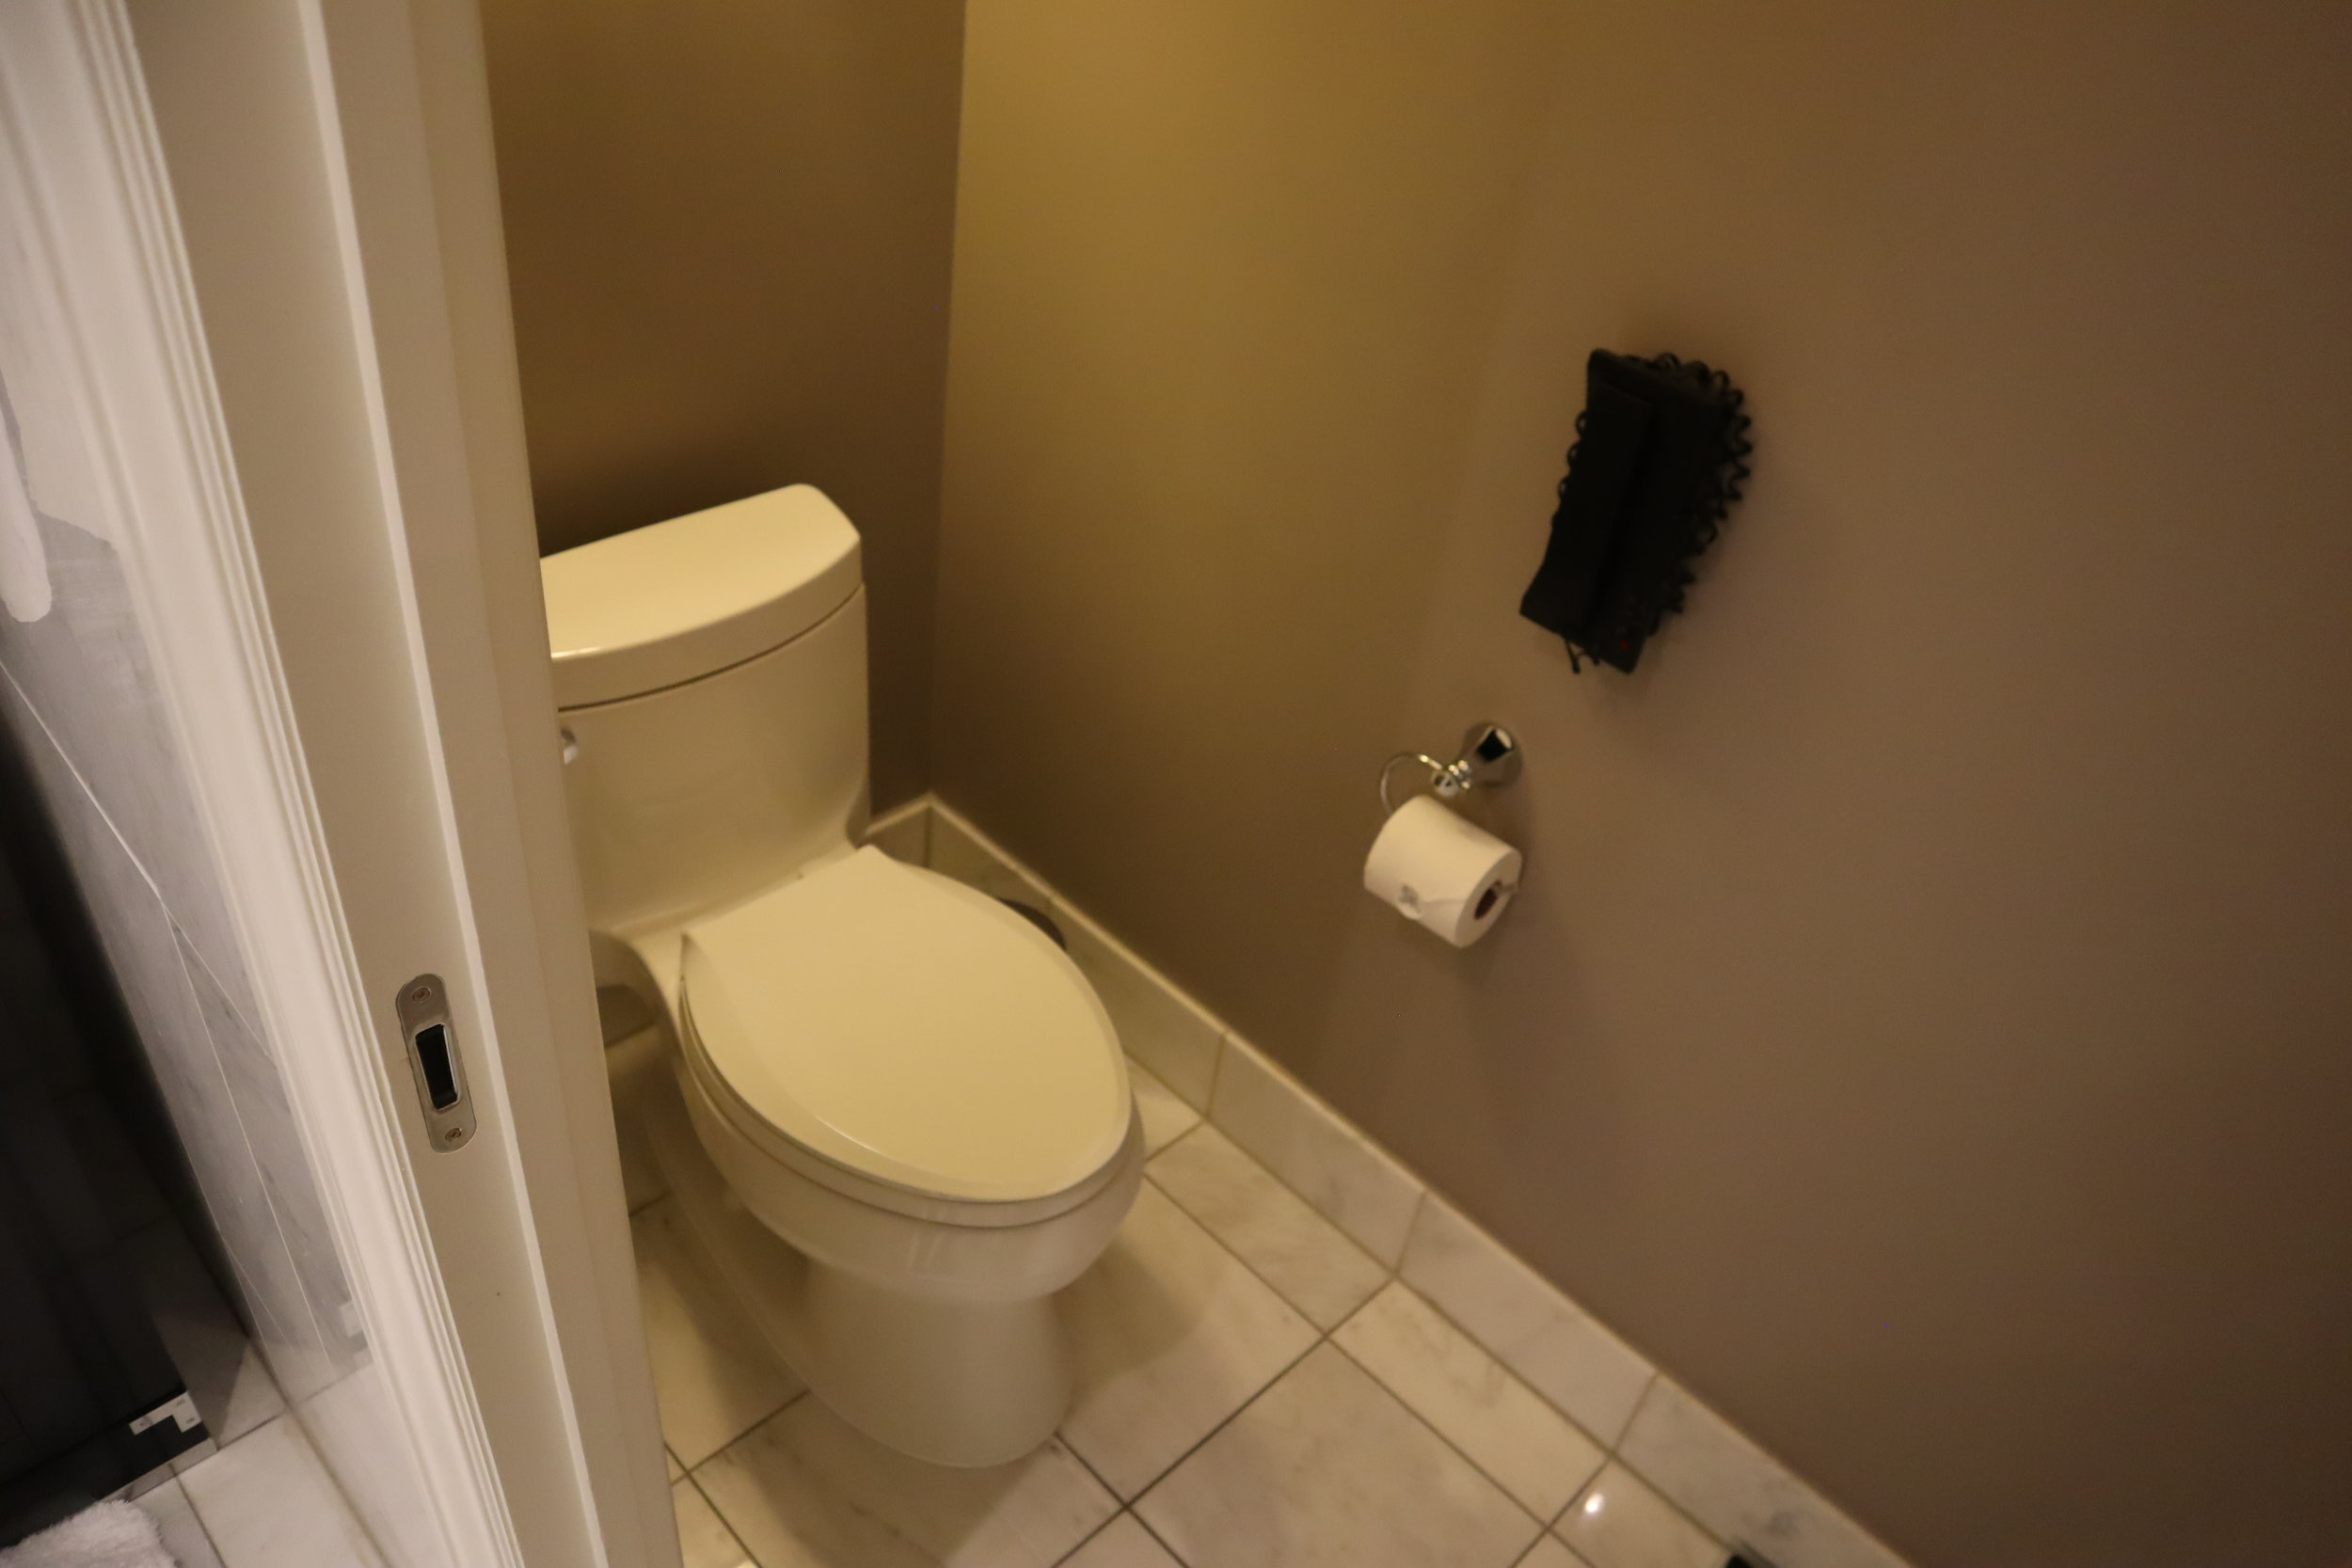 St. Regis Toronto – Two-bedroom suite master bathroom toilet